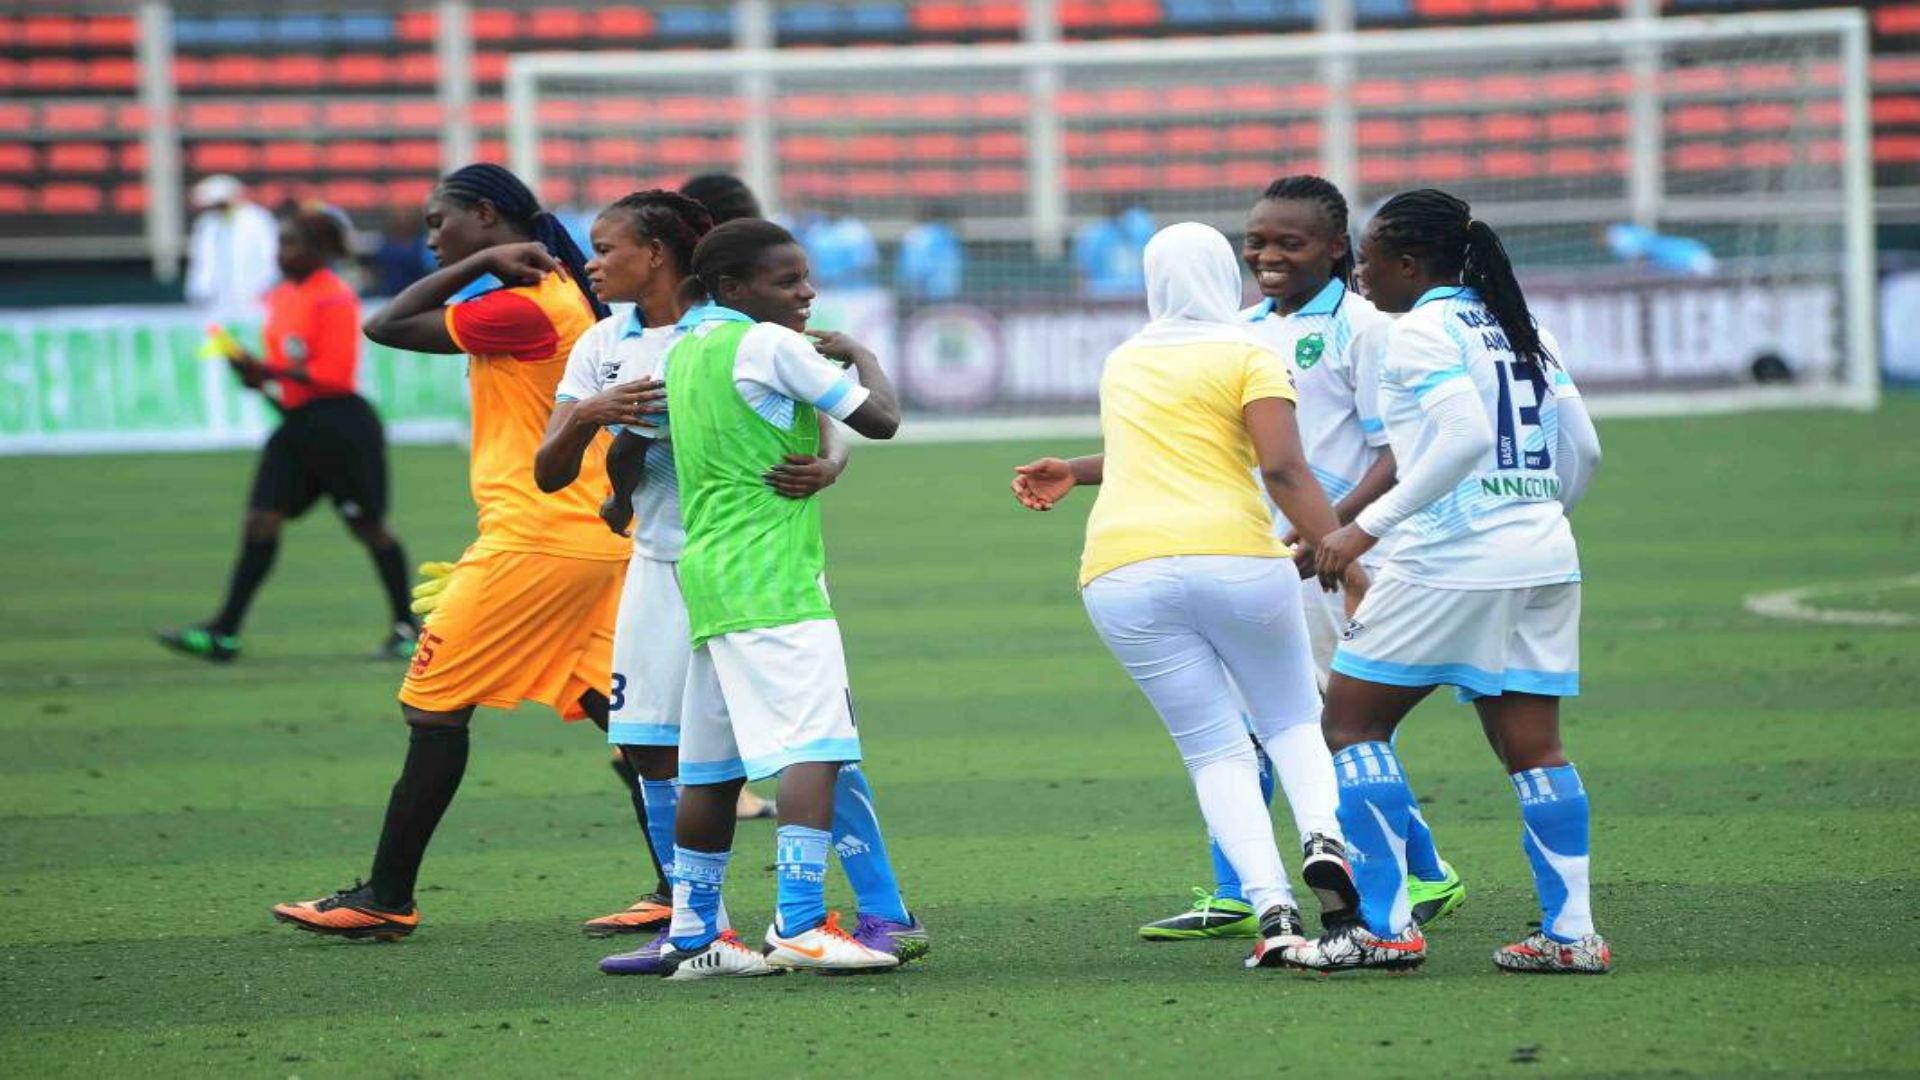 Coronavirus: Nigeria Women's Premier League suspended until further notice